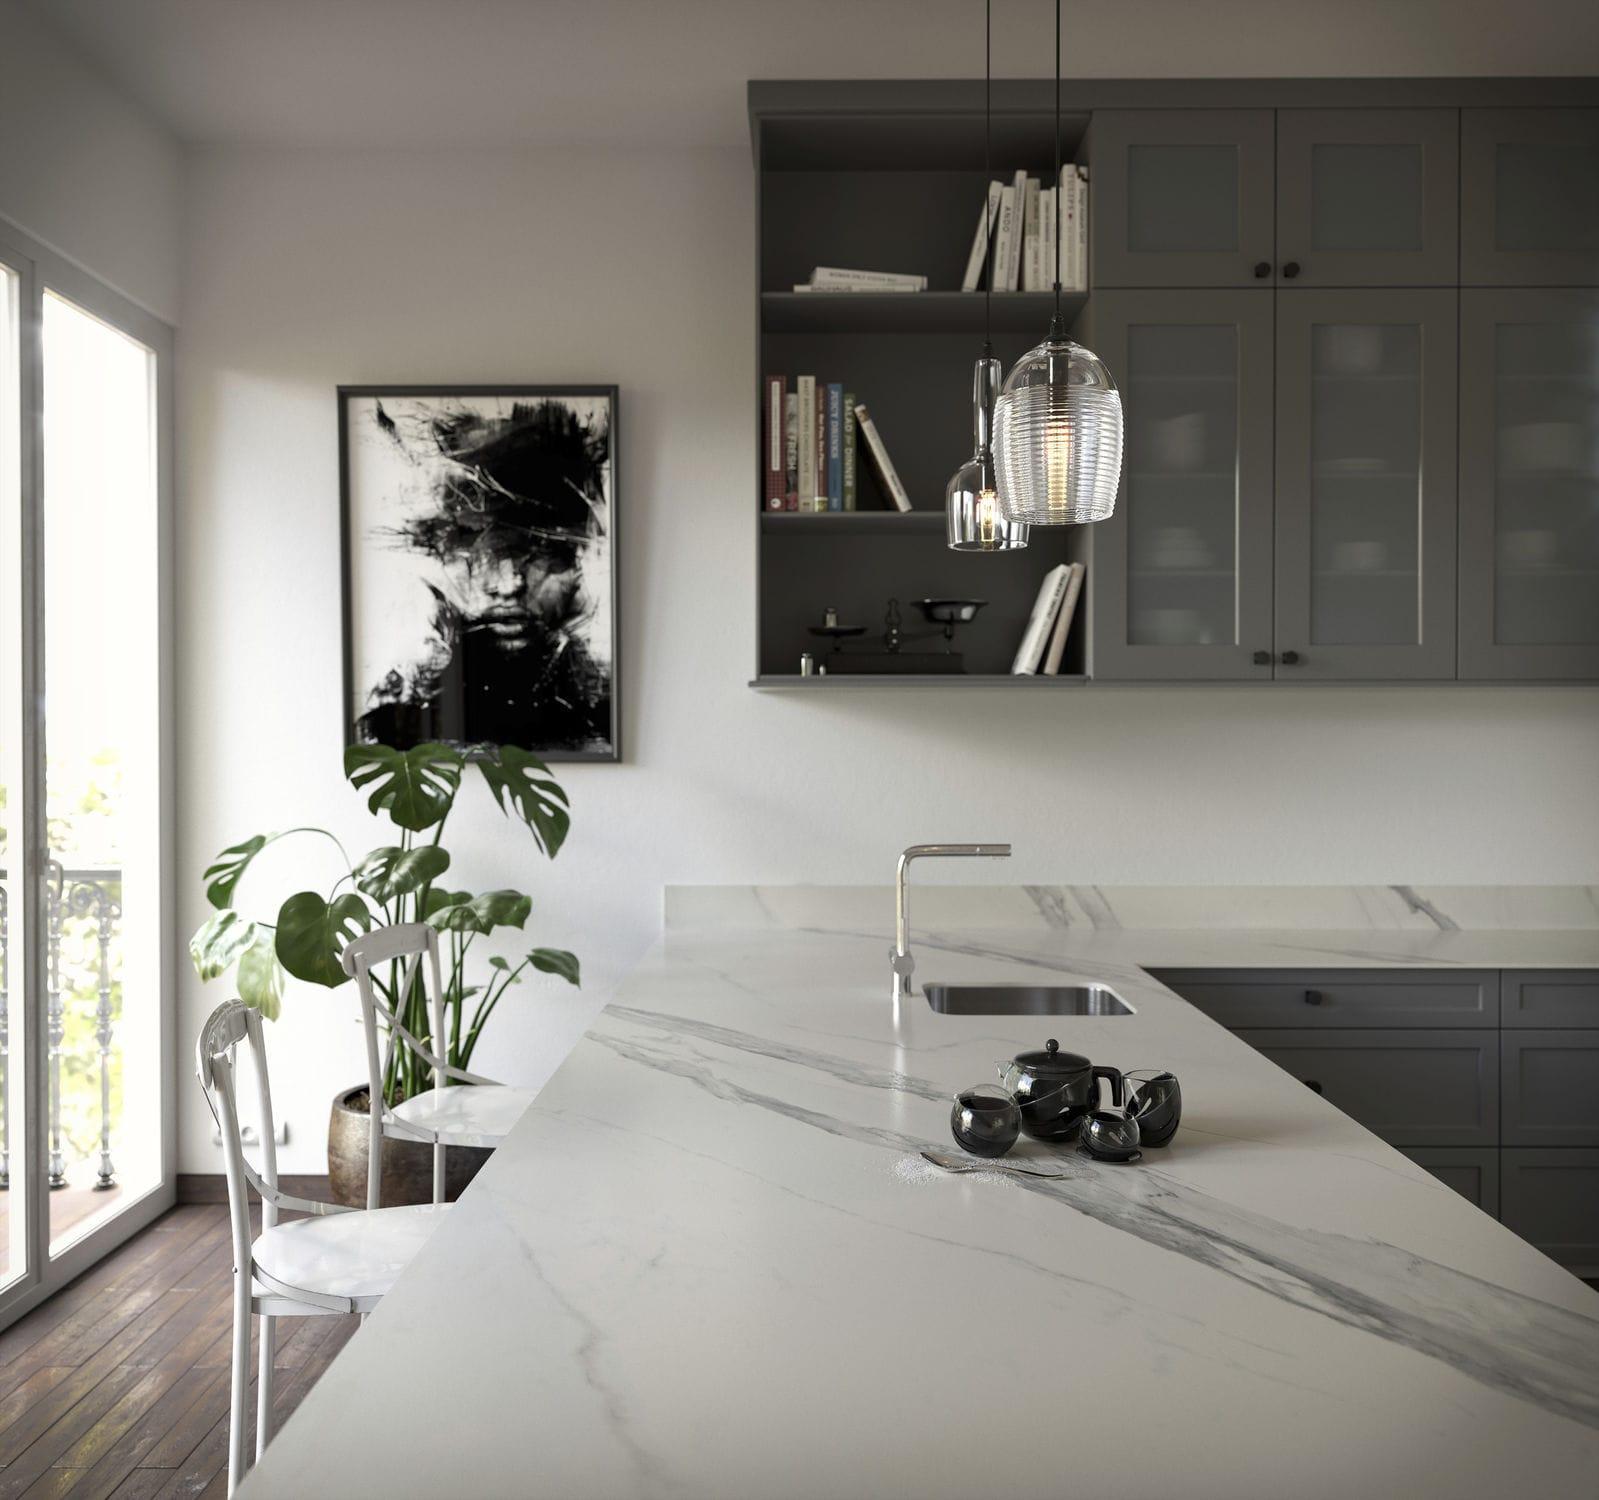 Marmor Kuchenarbeitsplatte Arbeitsplatte Marmor Schwarz Elegant